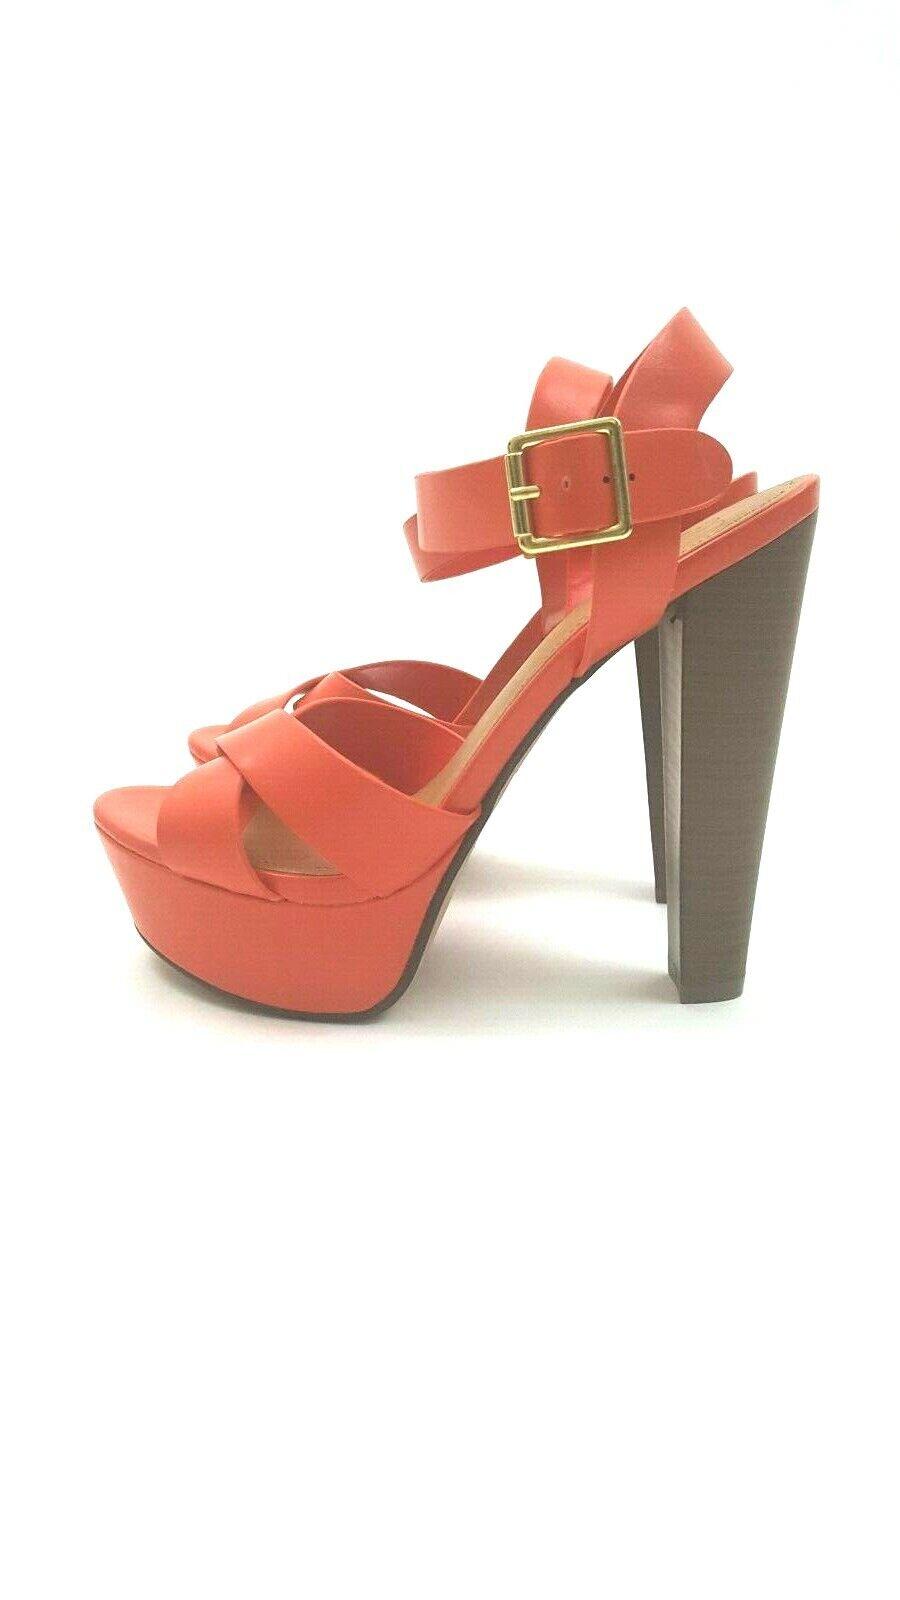 Coral Ankle Strap Chunky Stiletto Heel Platform Sandal 8.5 M